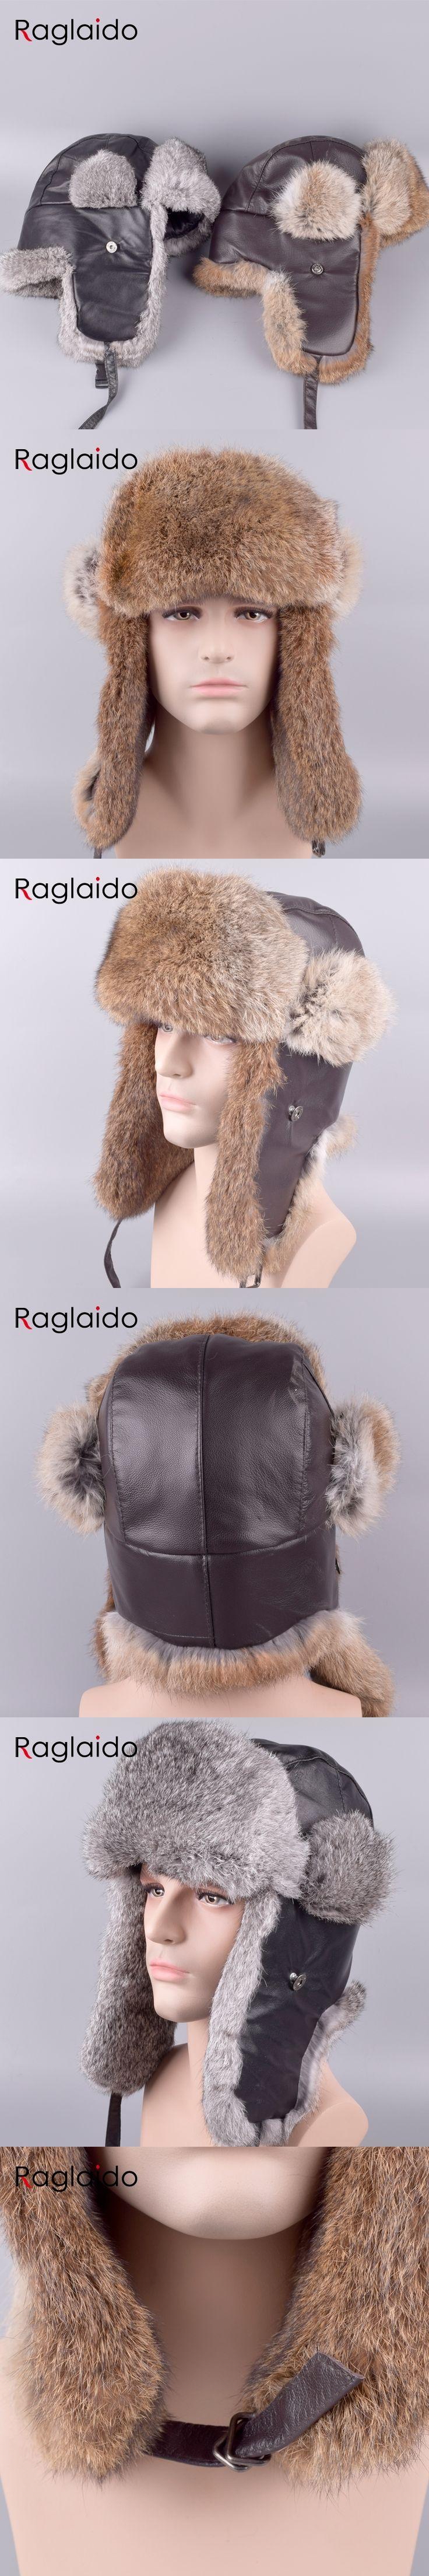 Raglaido Ushanka Fur Hats for Men Outdoor Winter Real Rabbit Fur Trapper Hats+Genuine leather snow caps Russian ear cap LQ11203